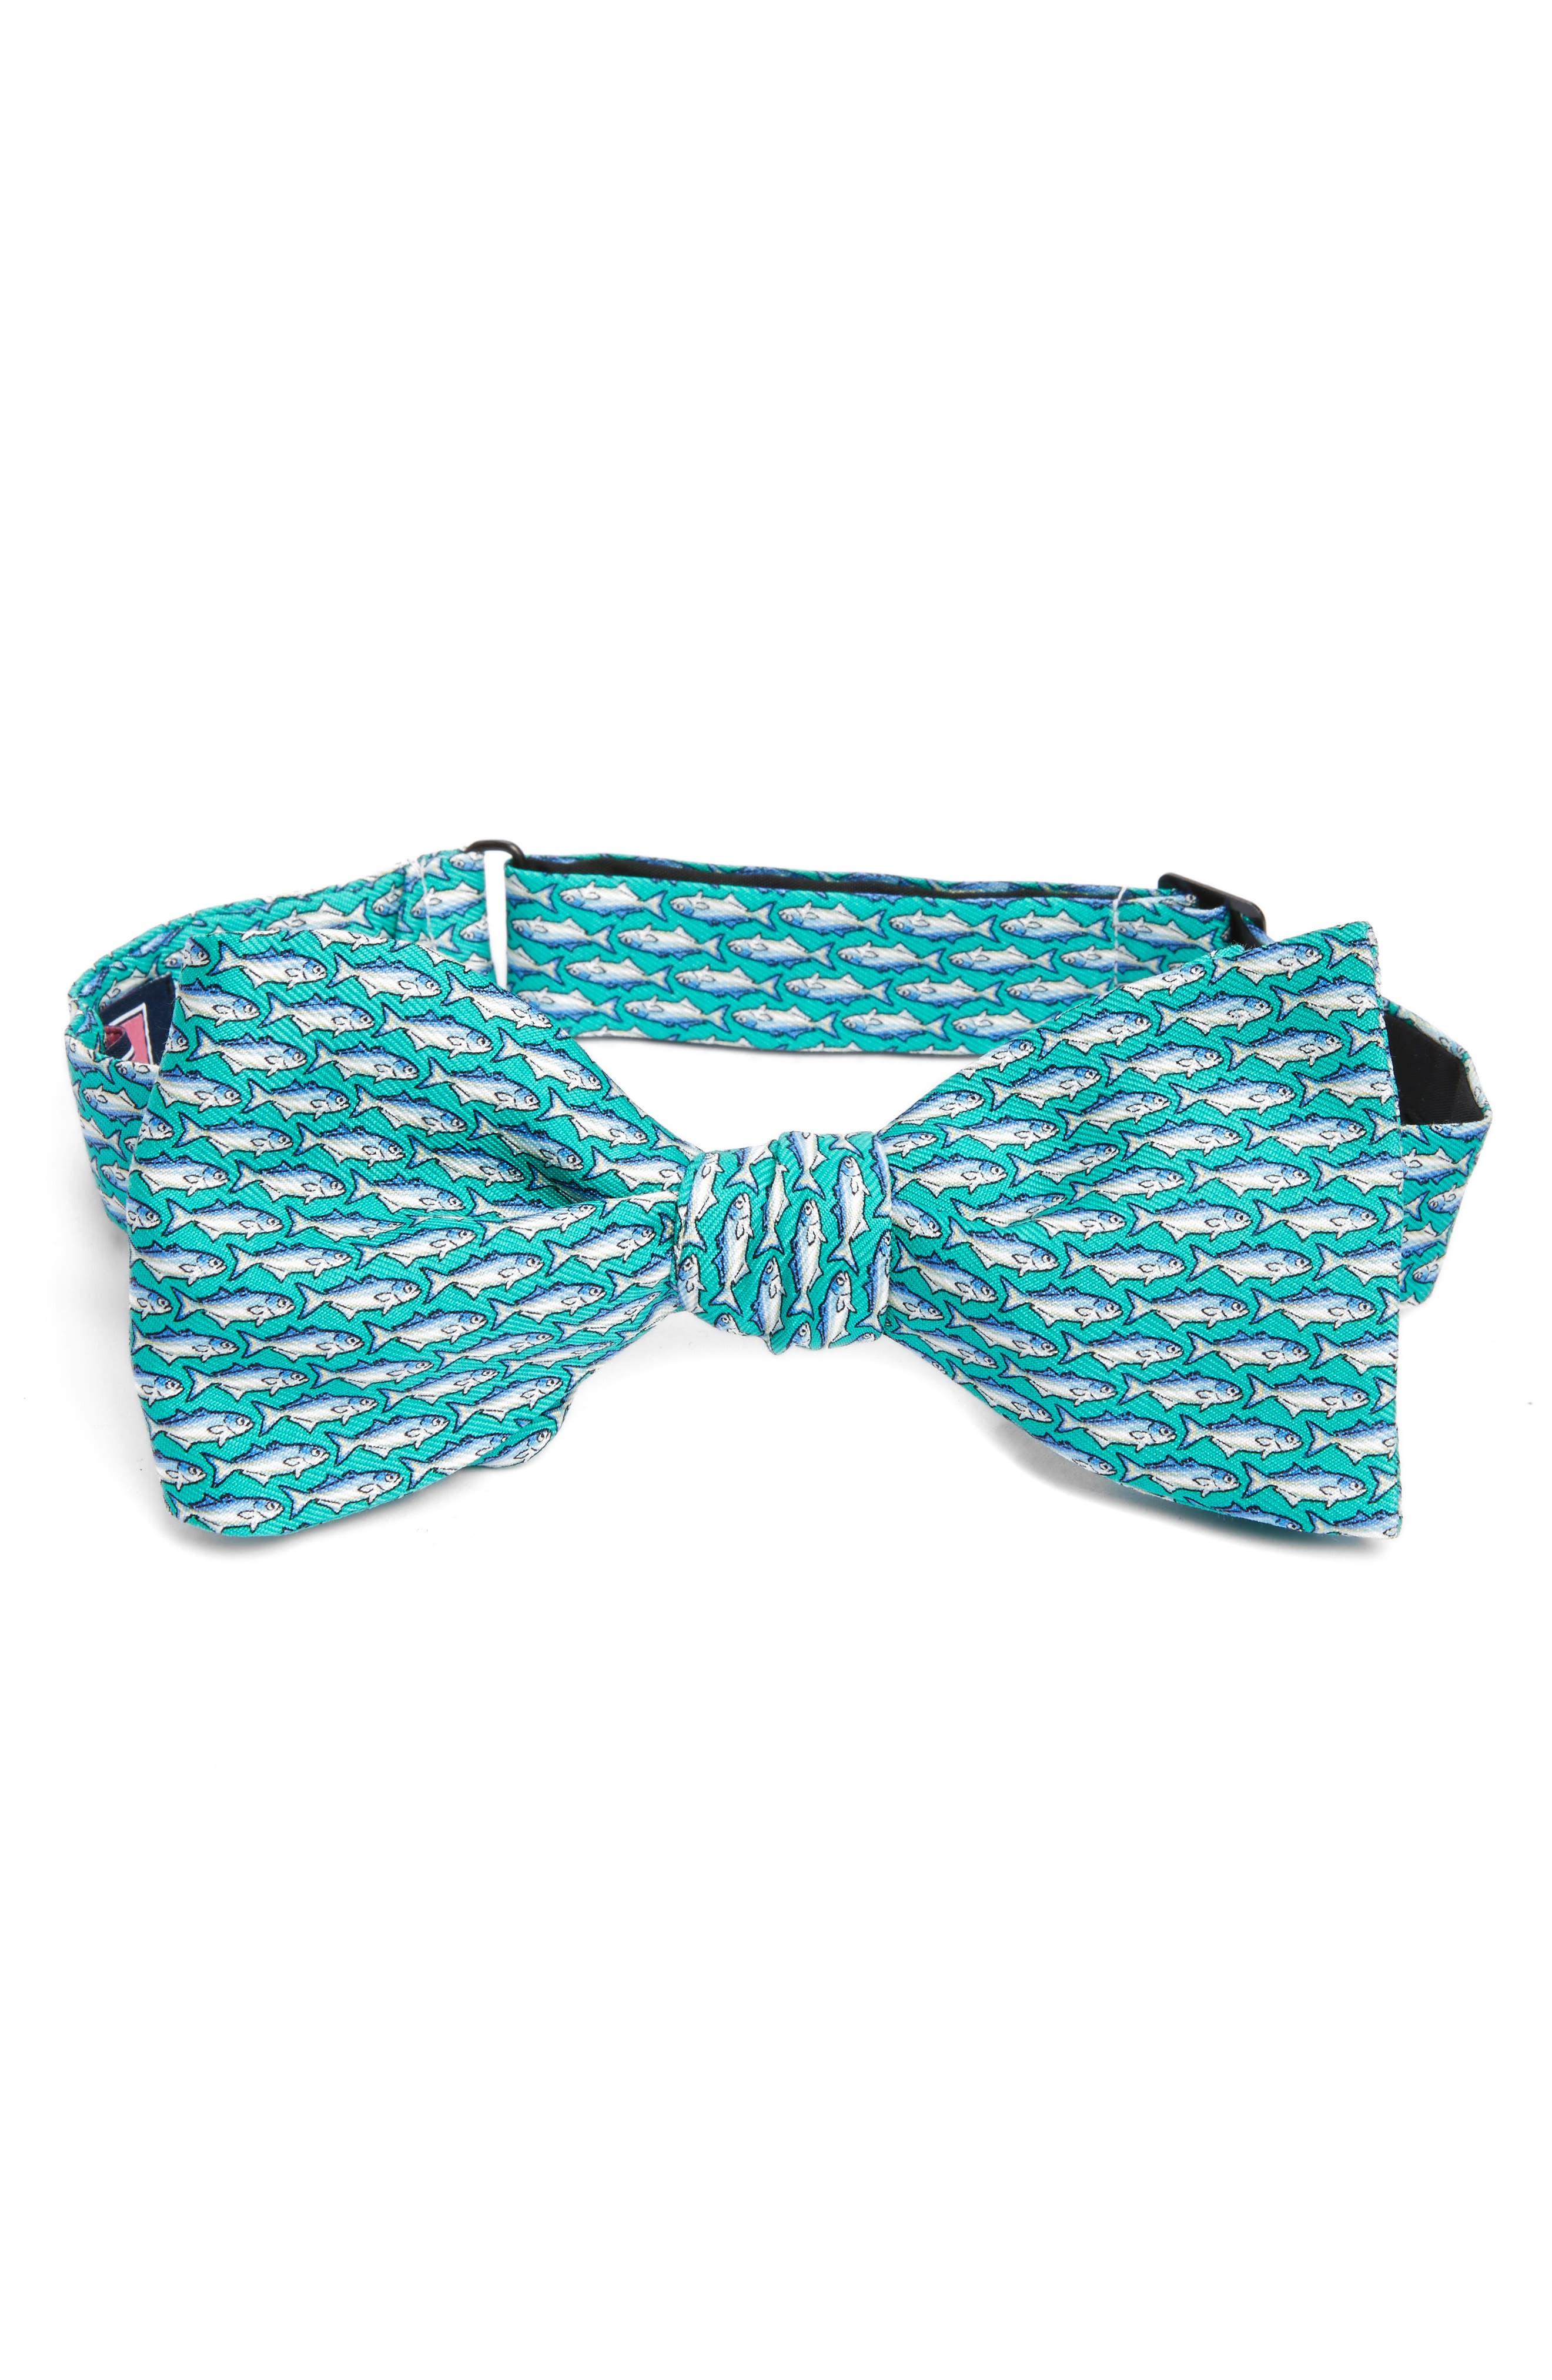 Blue Fish Print Silk Bow Tie,                             Main thumbnail 1, color,                             442